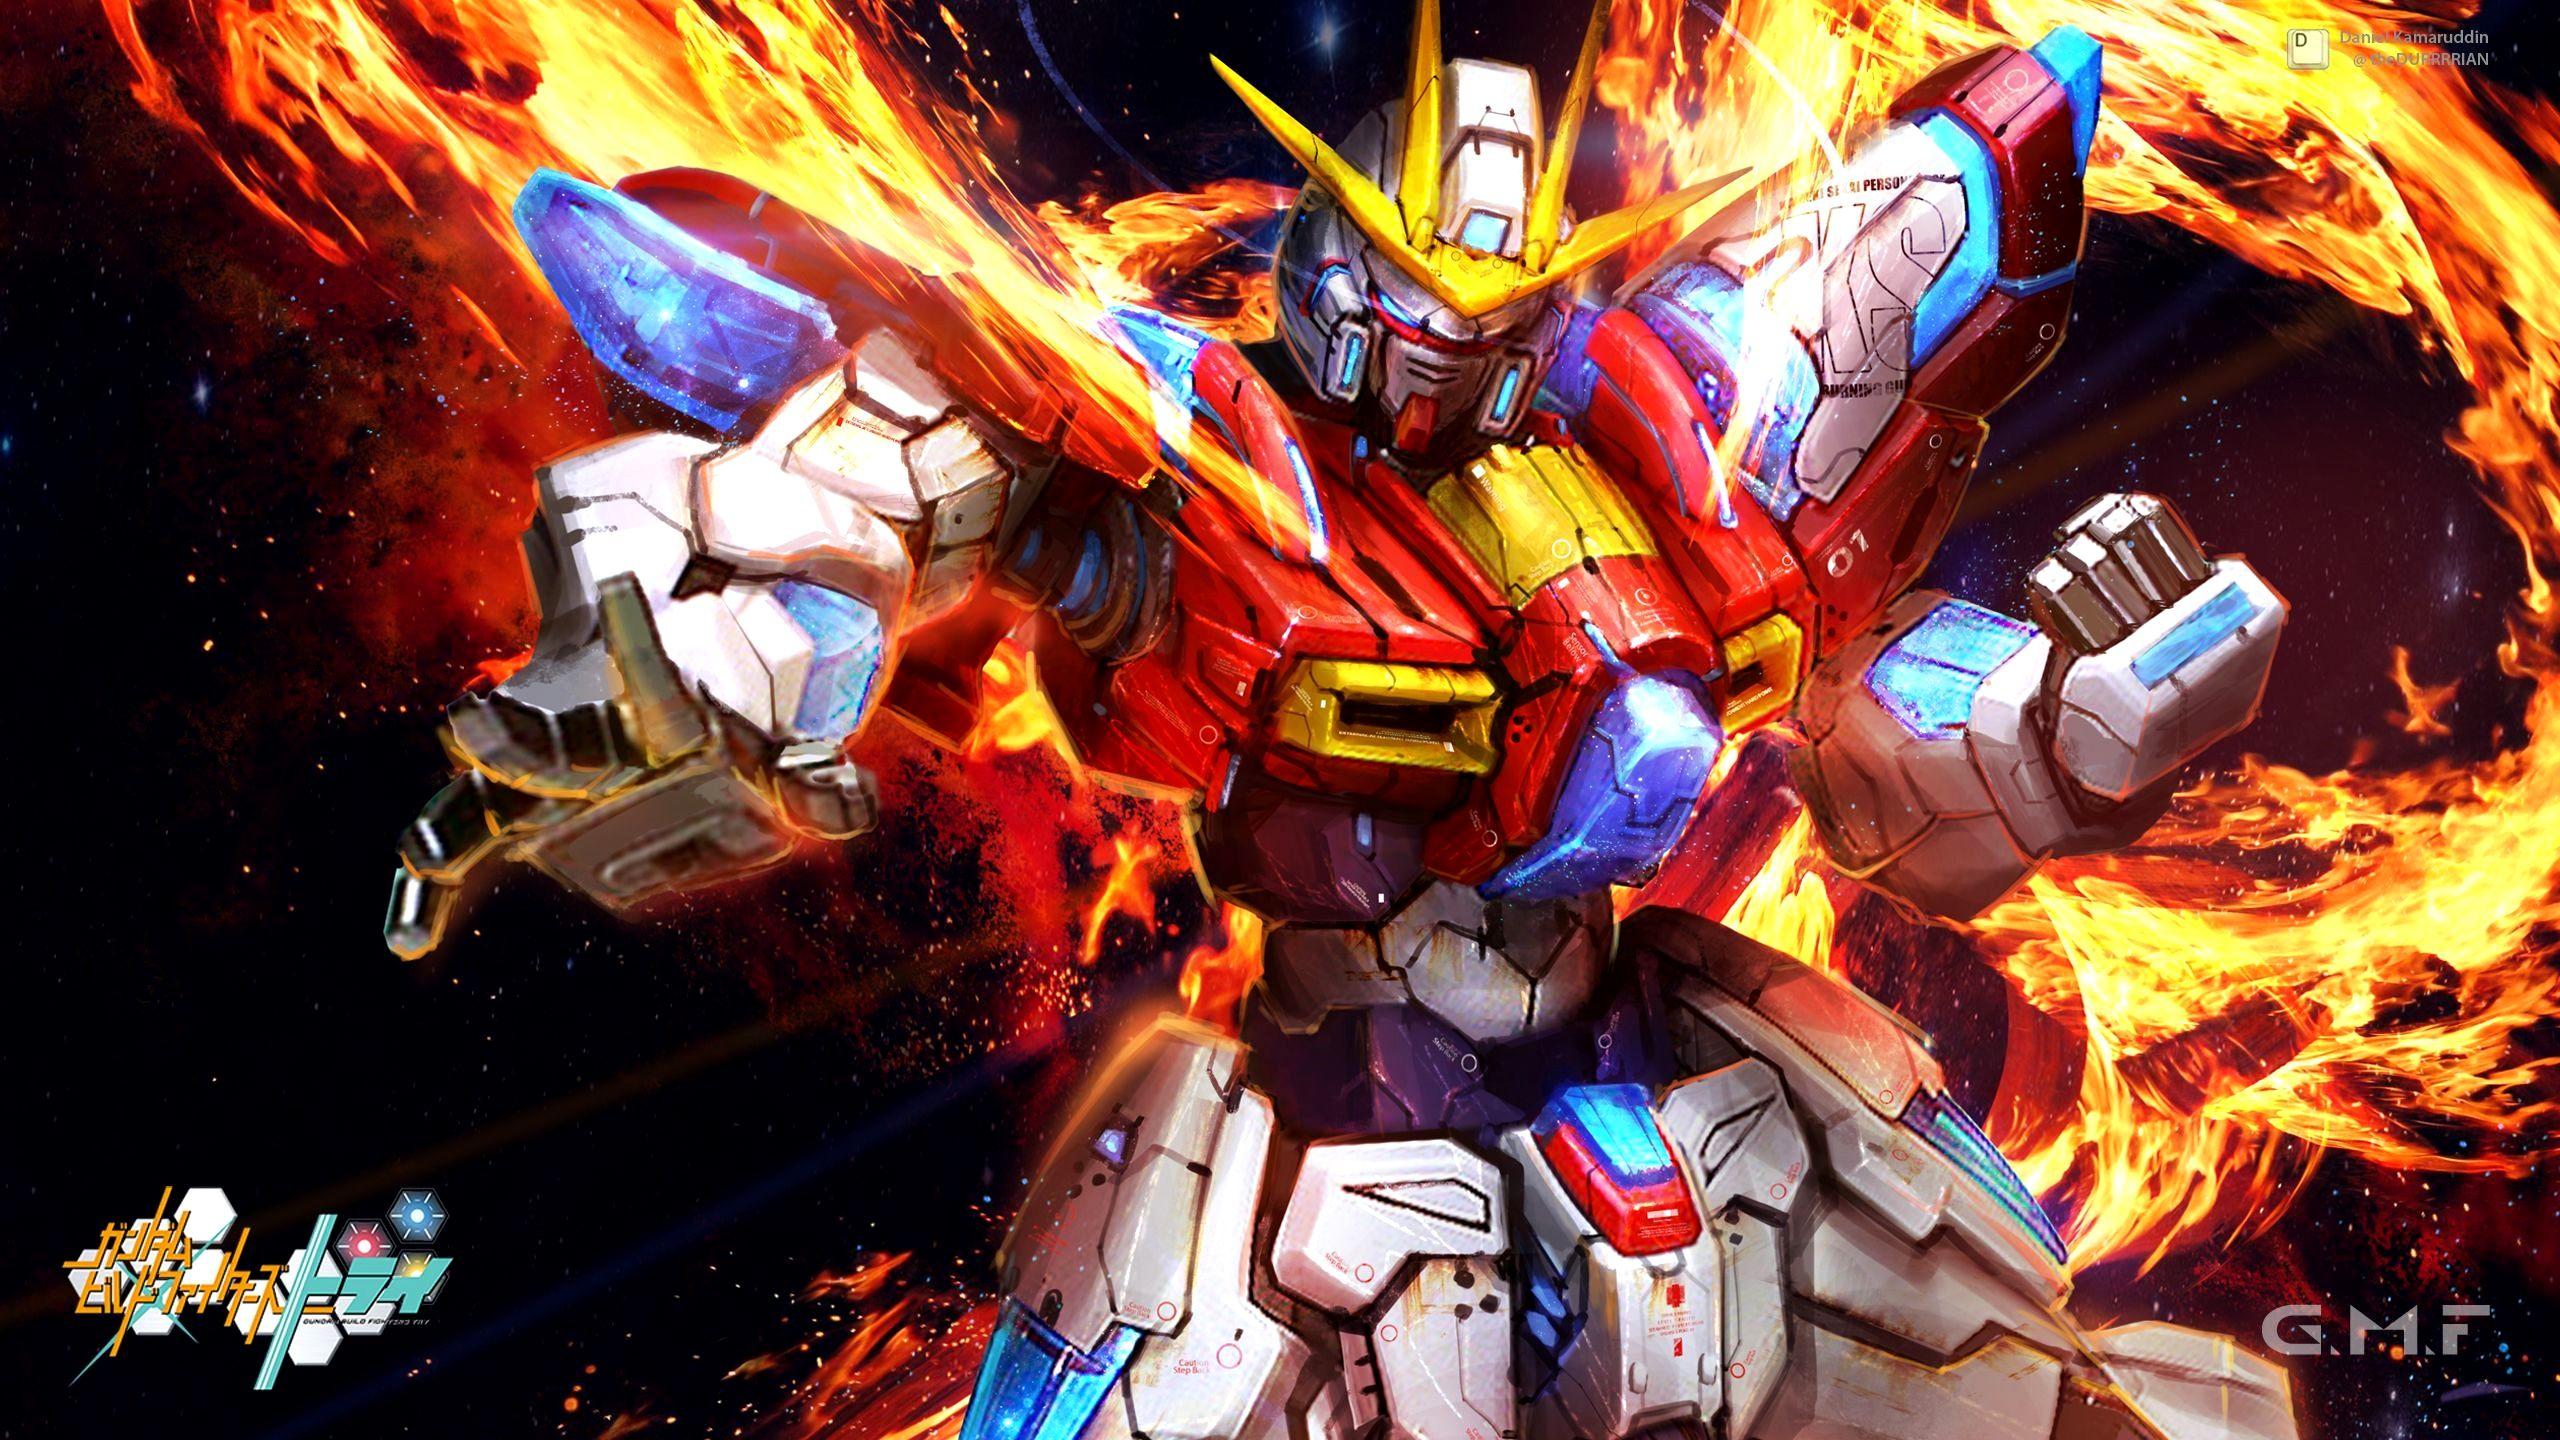 Gundam Wallpaper 4k Hd Gallery Gundam